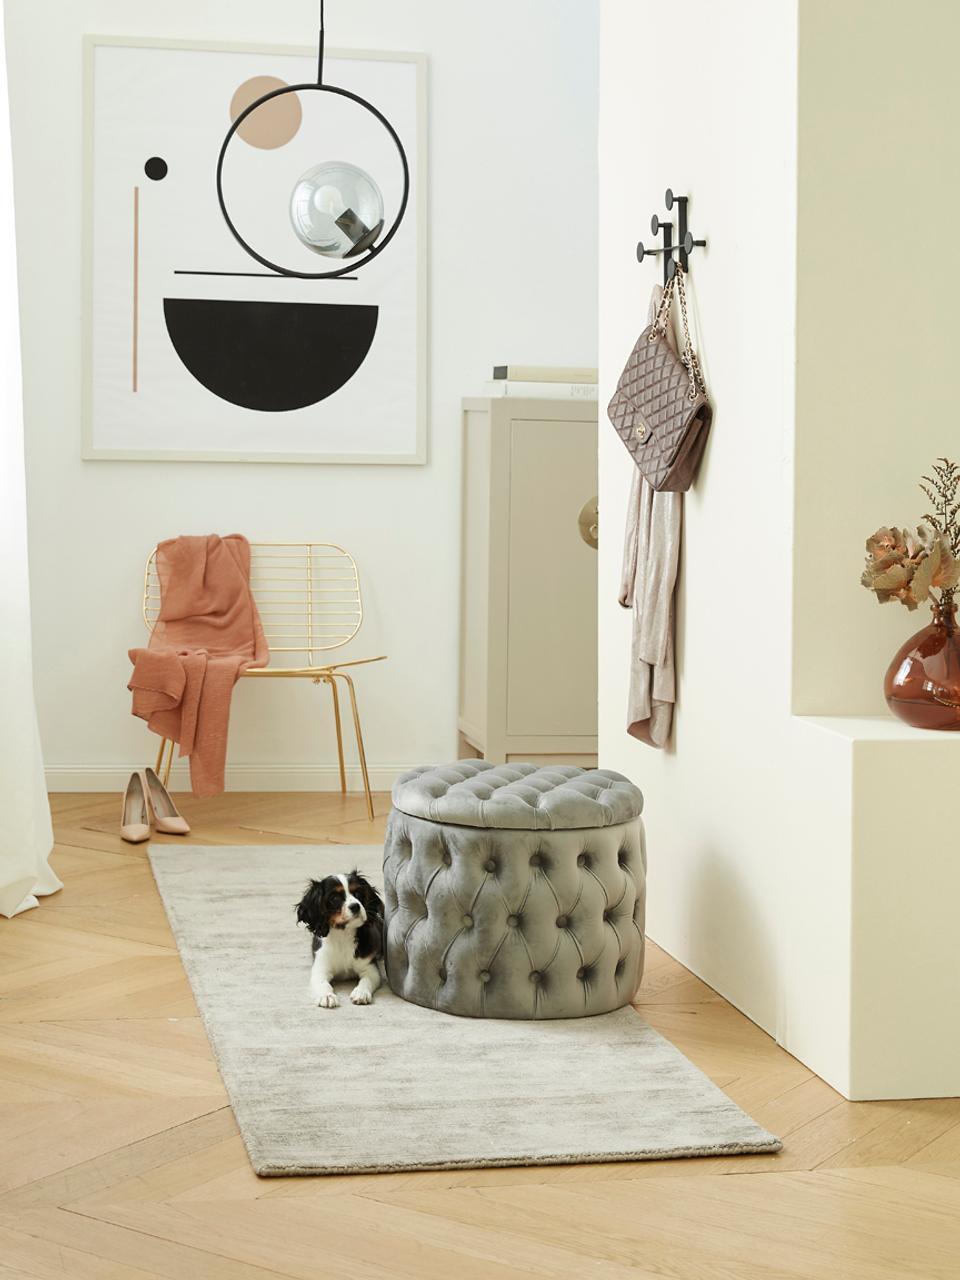 Samt-Hocker Chiara mit Stauraum, Bezug: Samt (Polyester) 20.000 S, Korpus: Eukalyptusholz, Grau, Ø 50 x H 42 cm